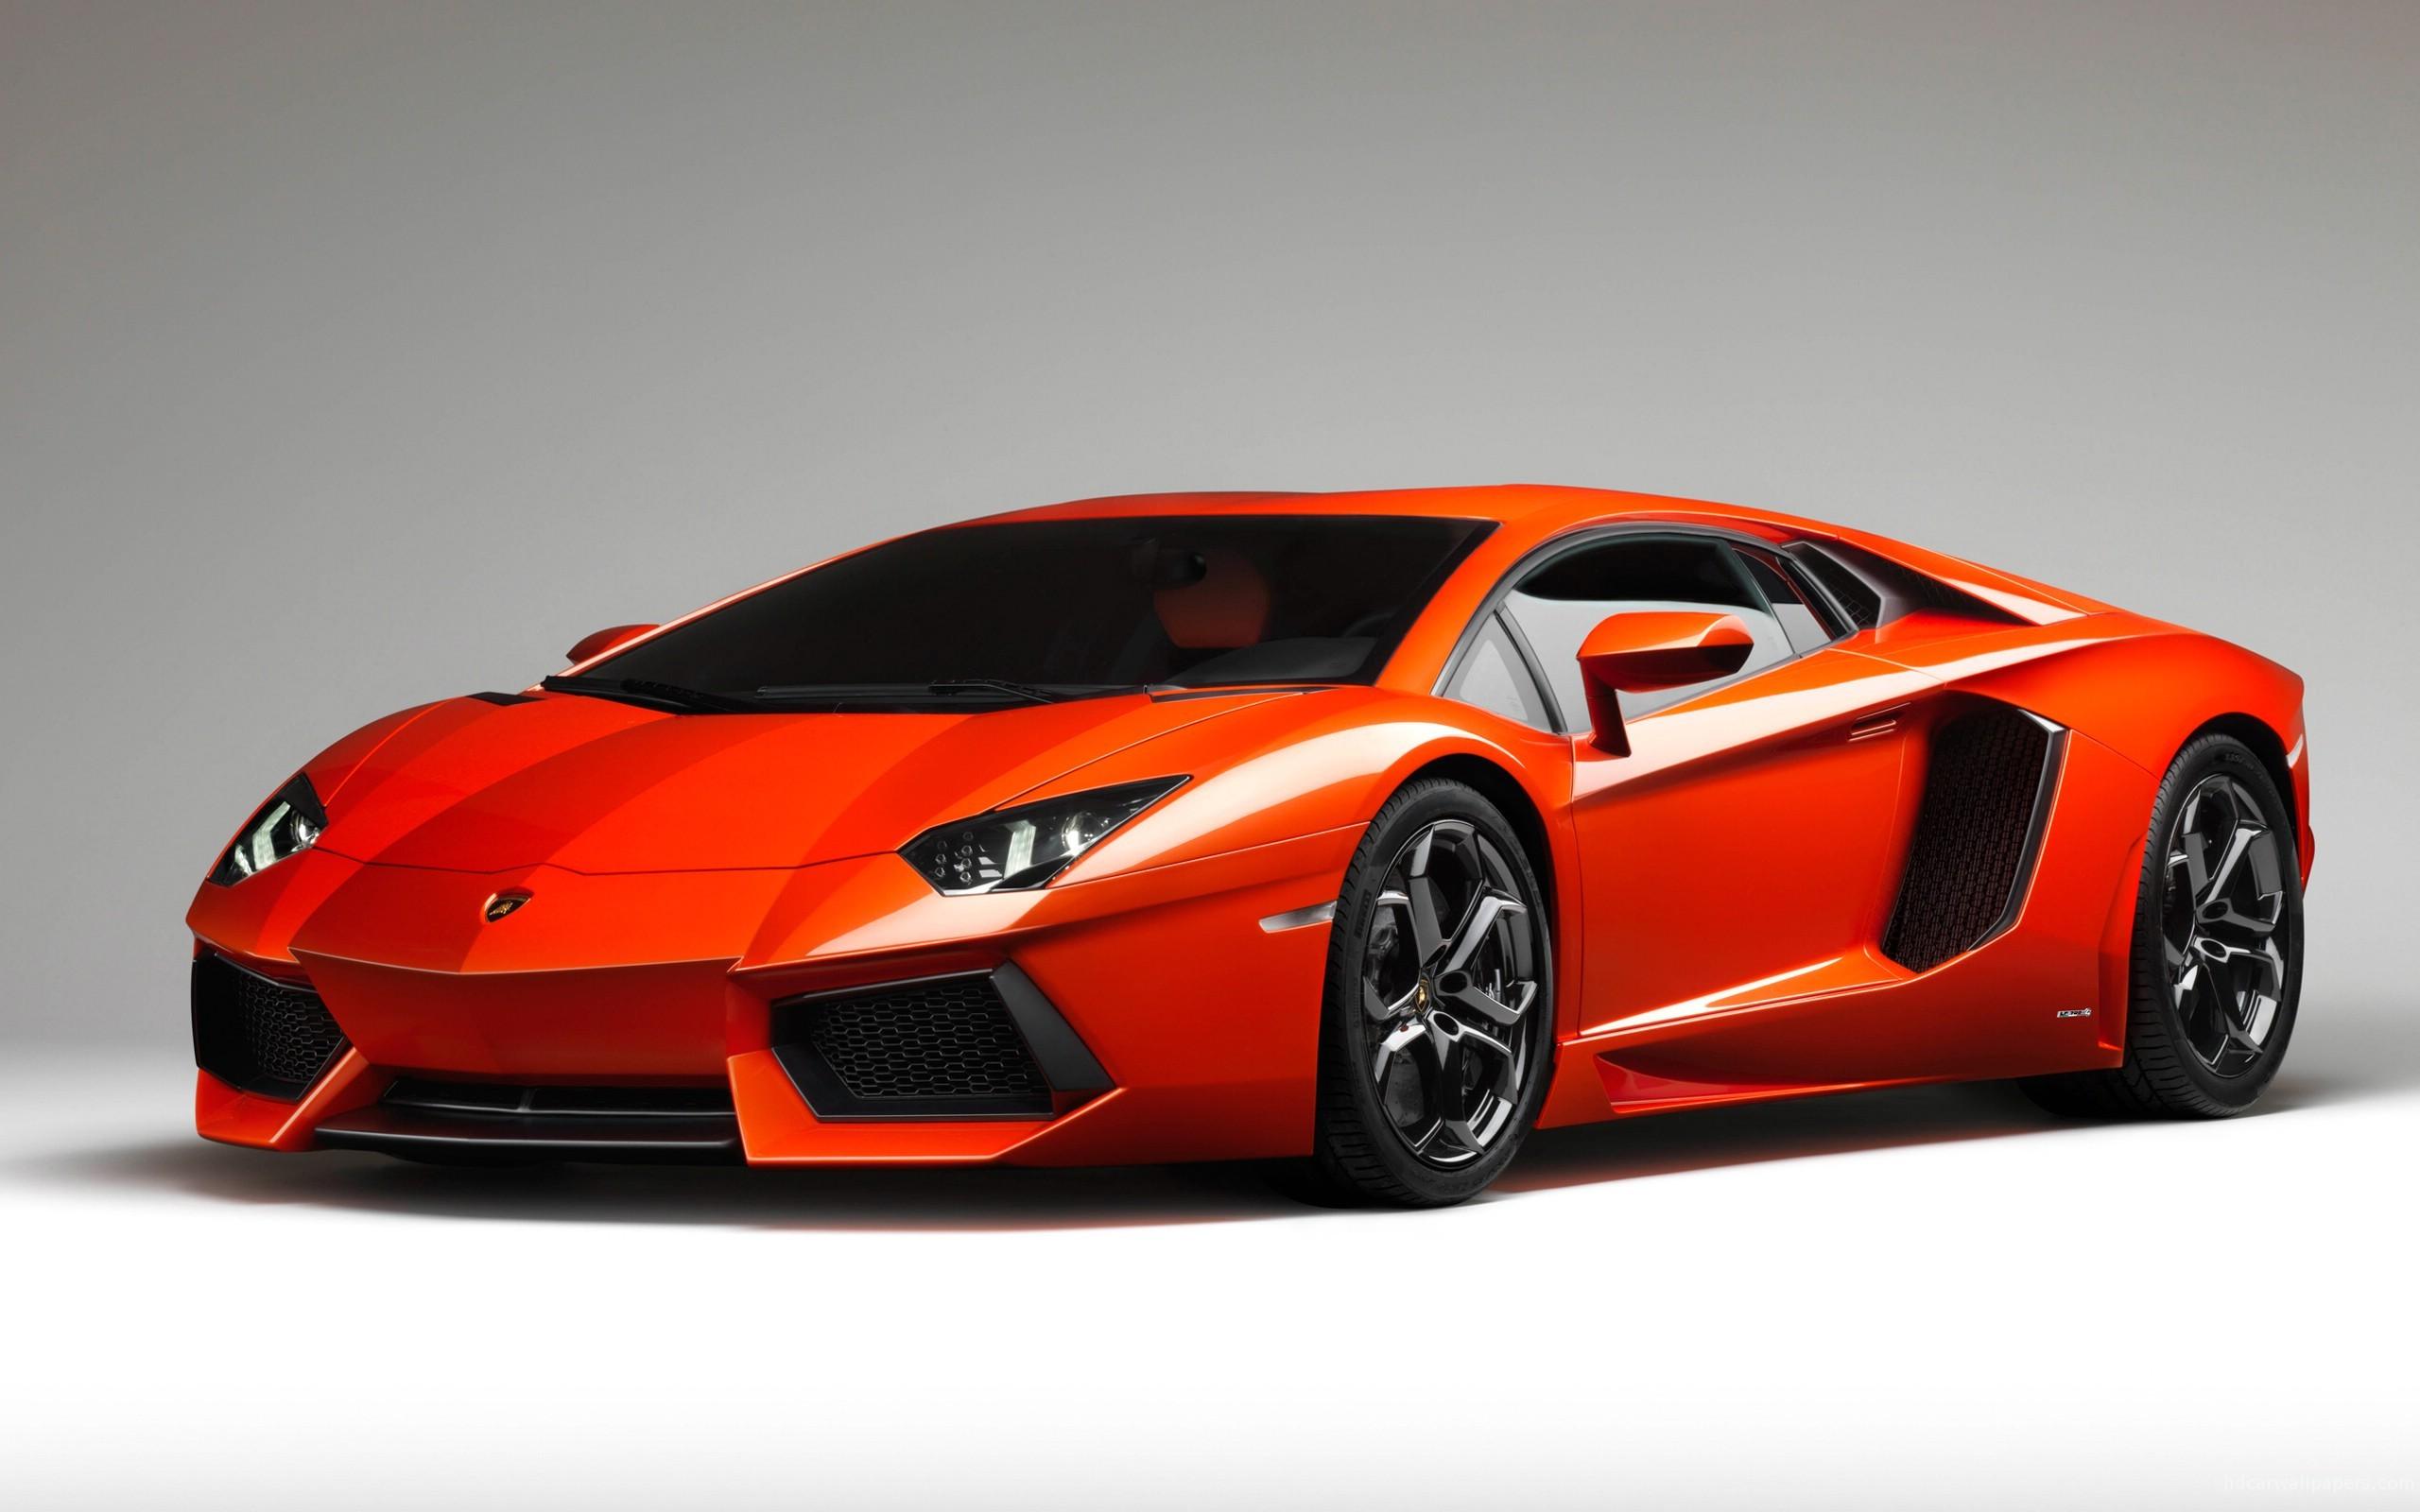 Lamborghini Aventador LP700 4 Wallpaper | HD Car ...